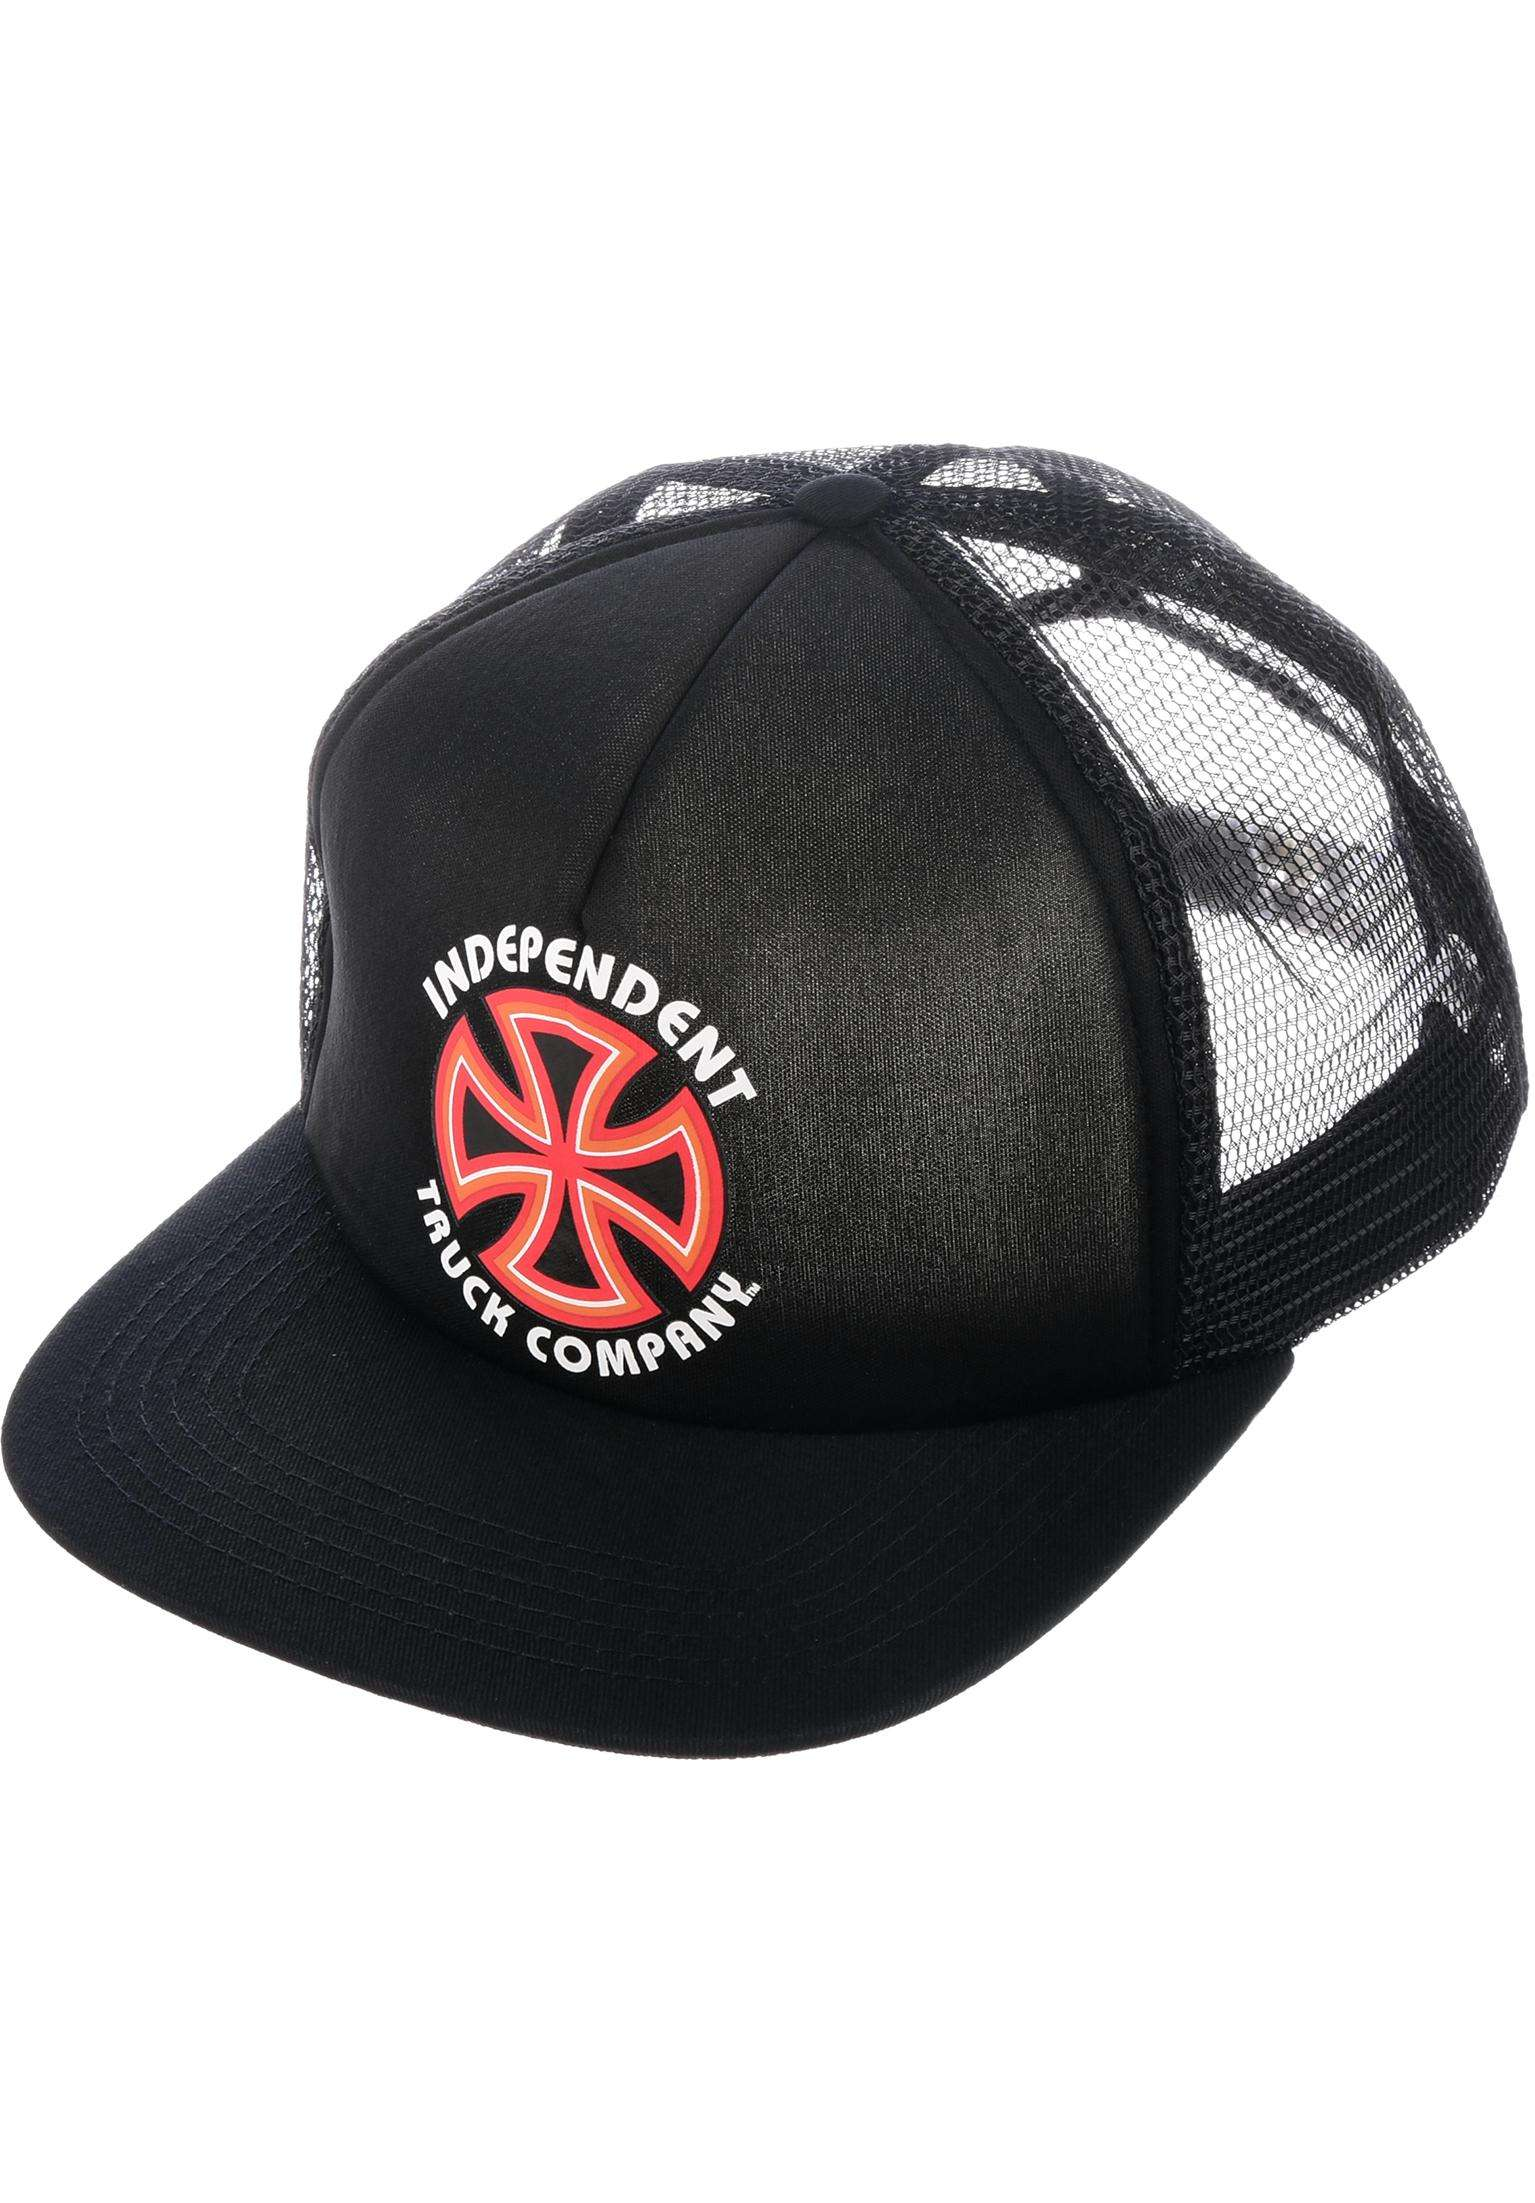 Bauhaus Mesh Independent Caps in black for Men  8579d63f6ef3